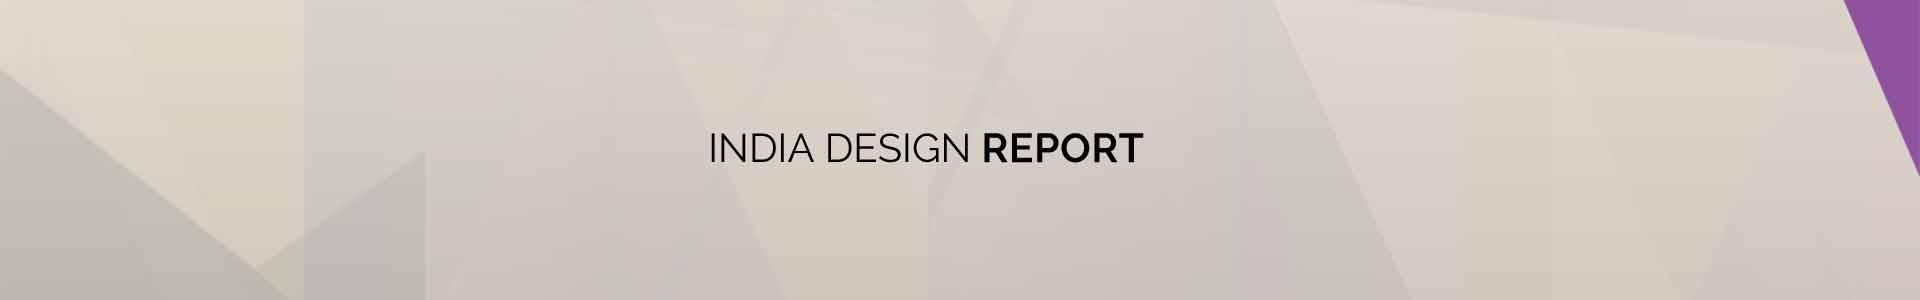 ciidesign-reports